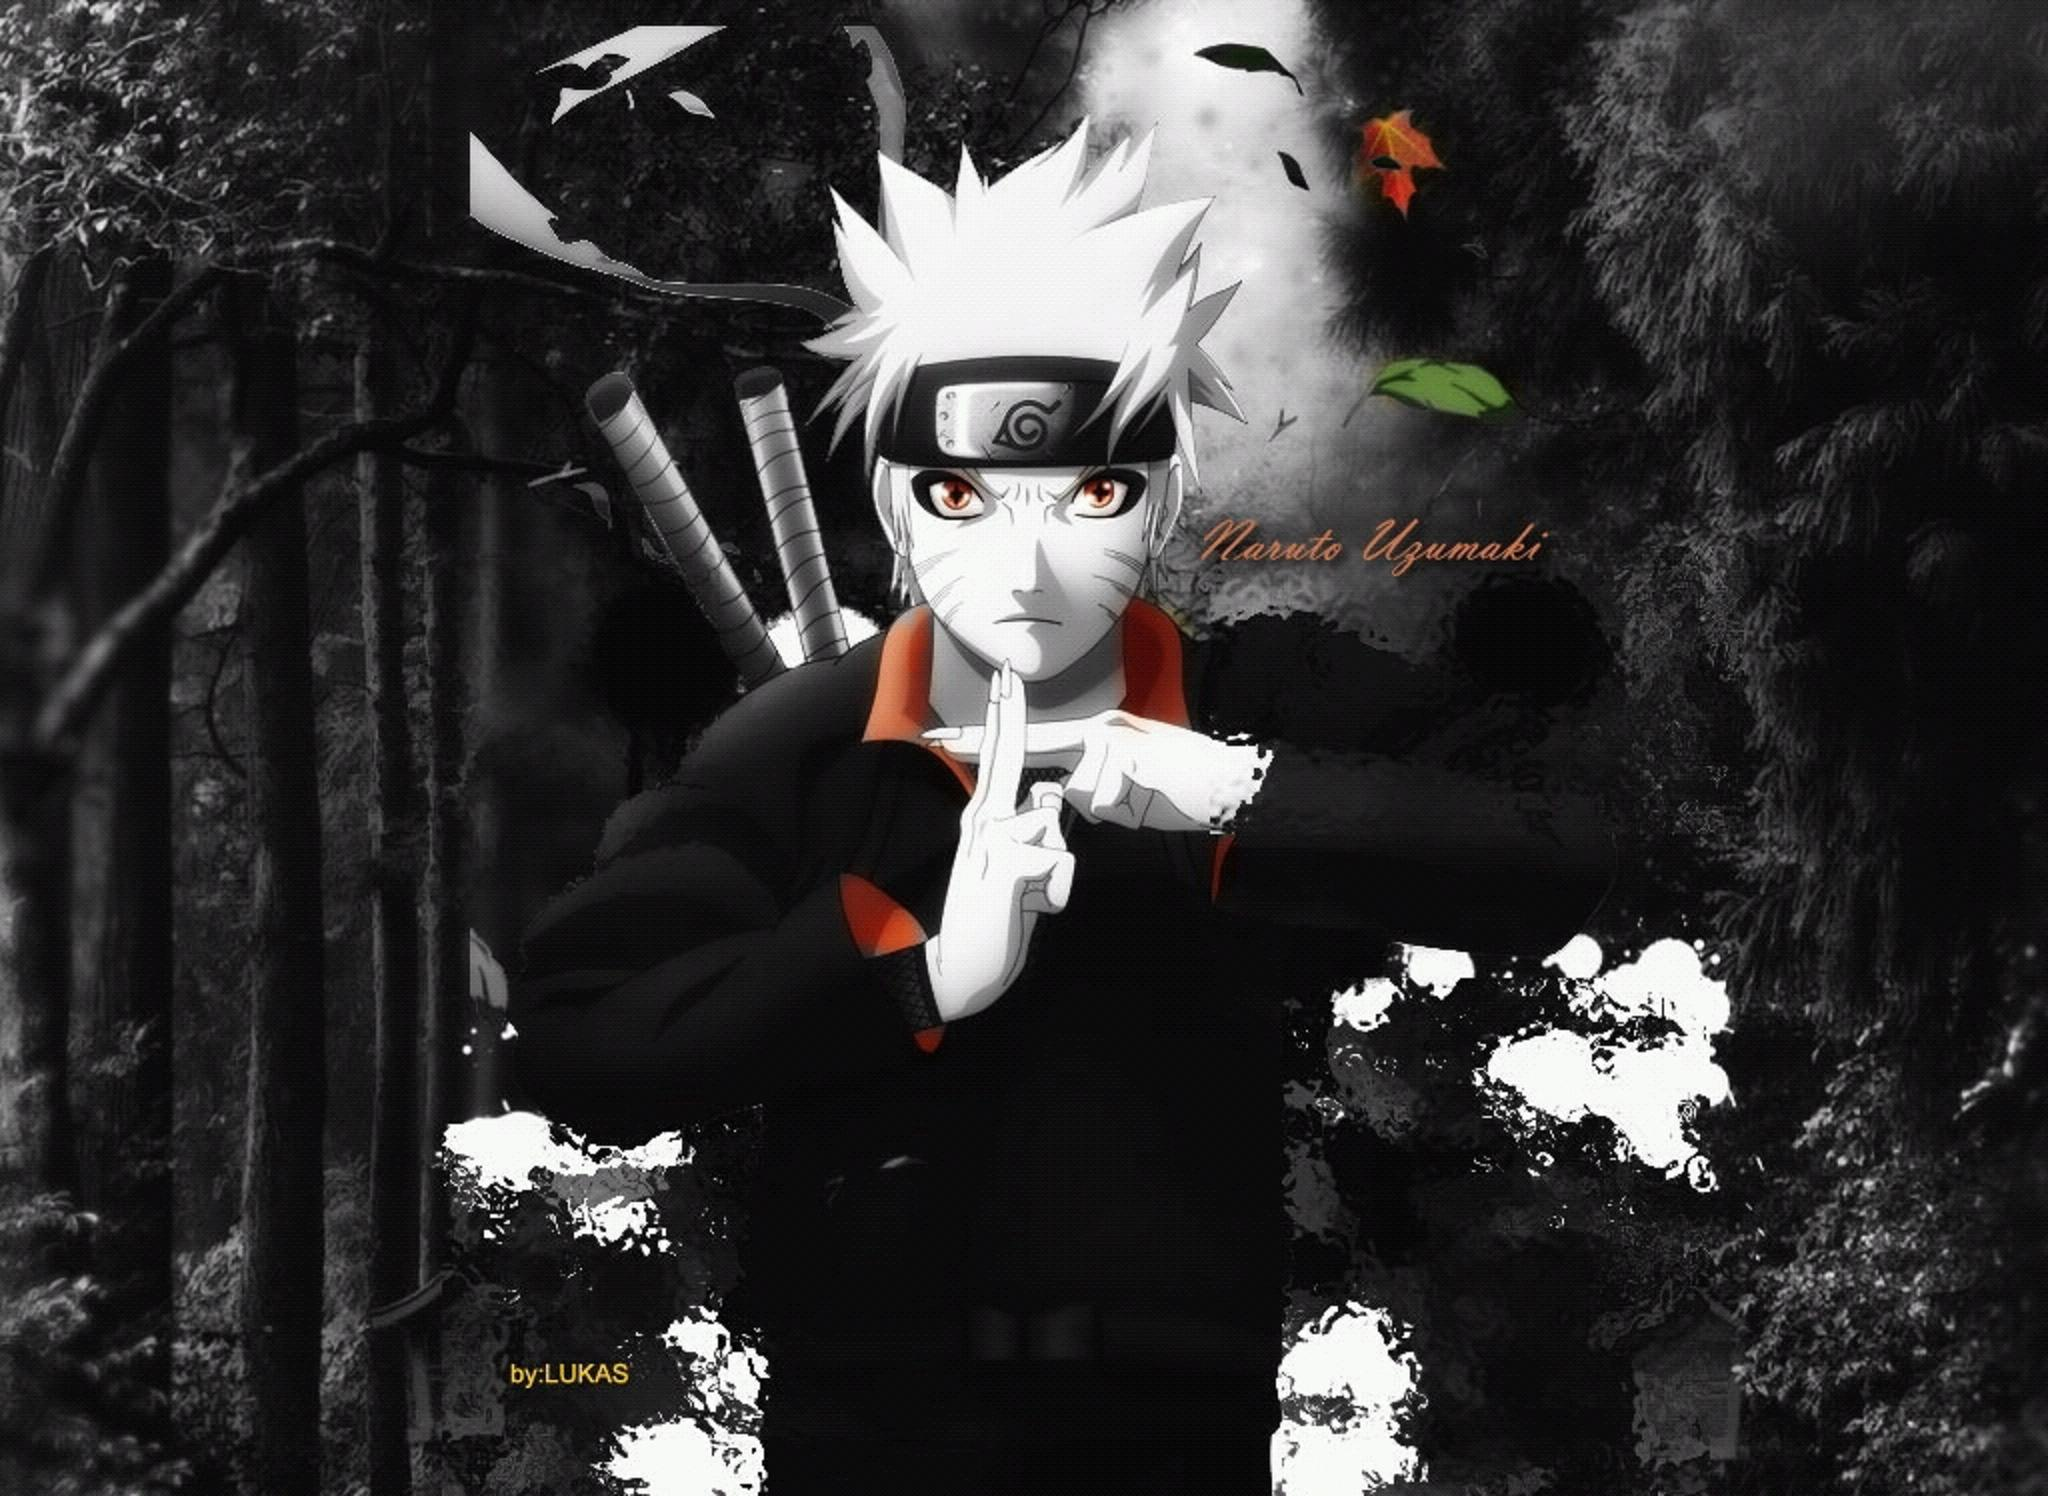 Naruto Uzumaki Wallpapers High Quality | Download Free